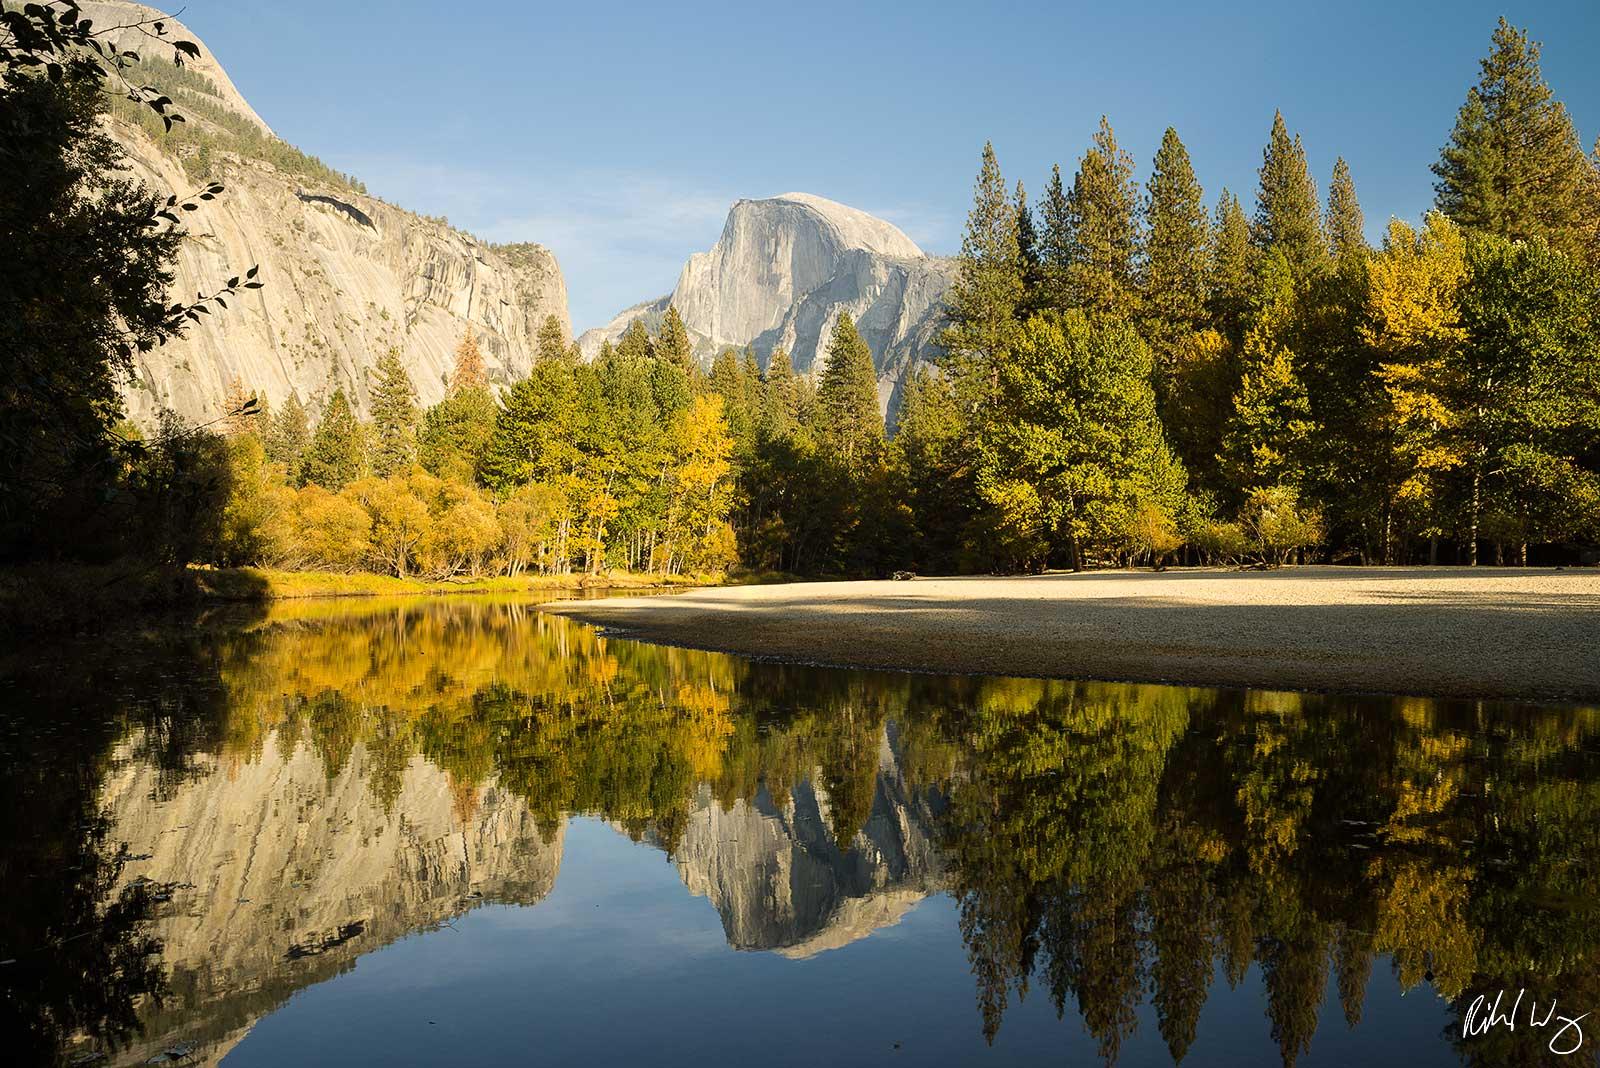 Half Dome & Fall Color Reflection in Merced River, Yosemite National Park, California, Photo, photo